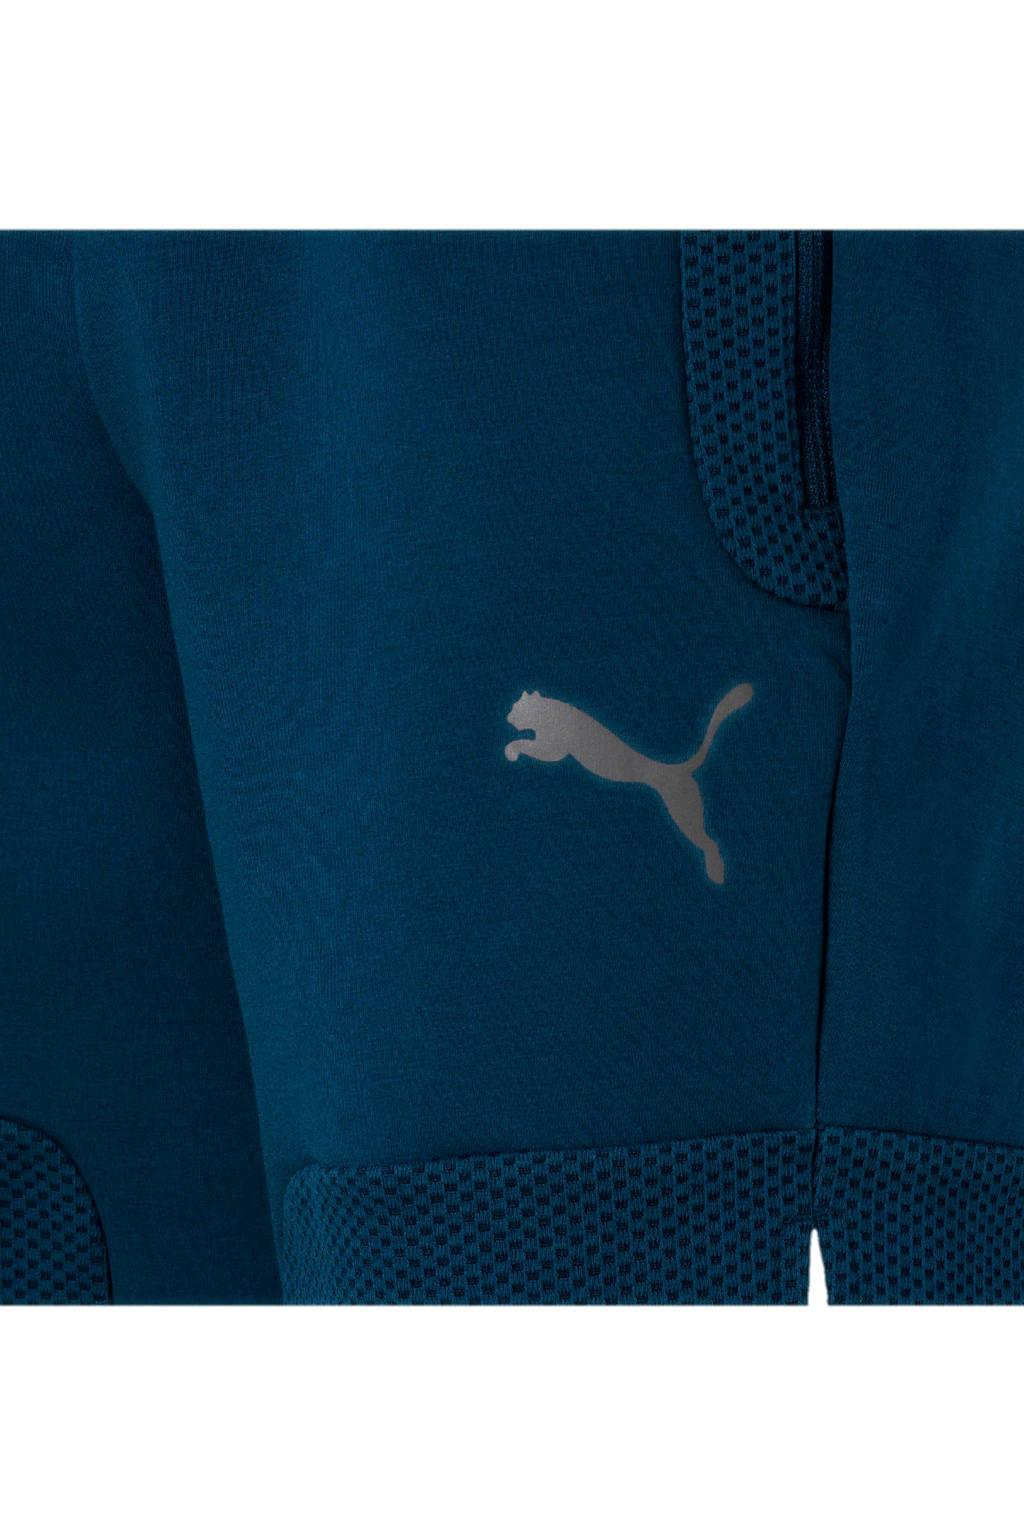 Puma   joggingshort blauw, Blauw